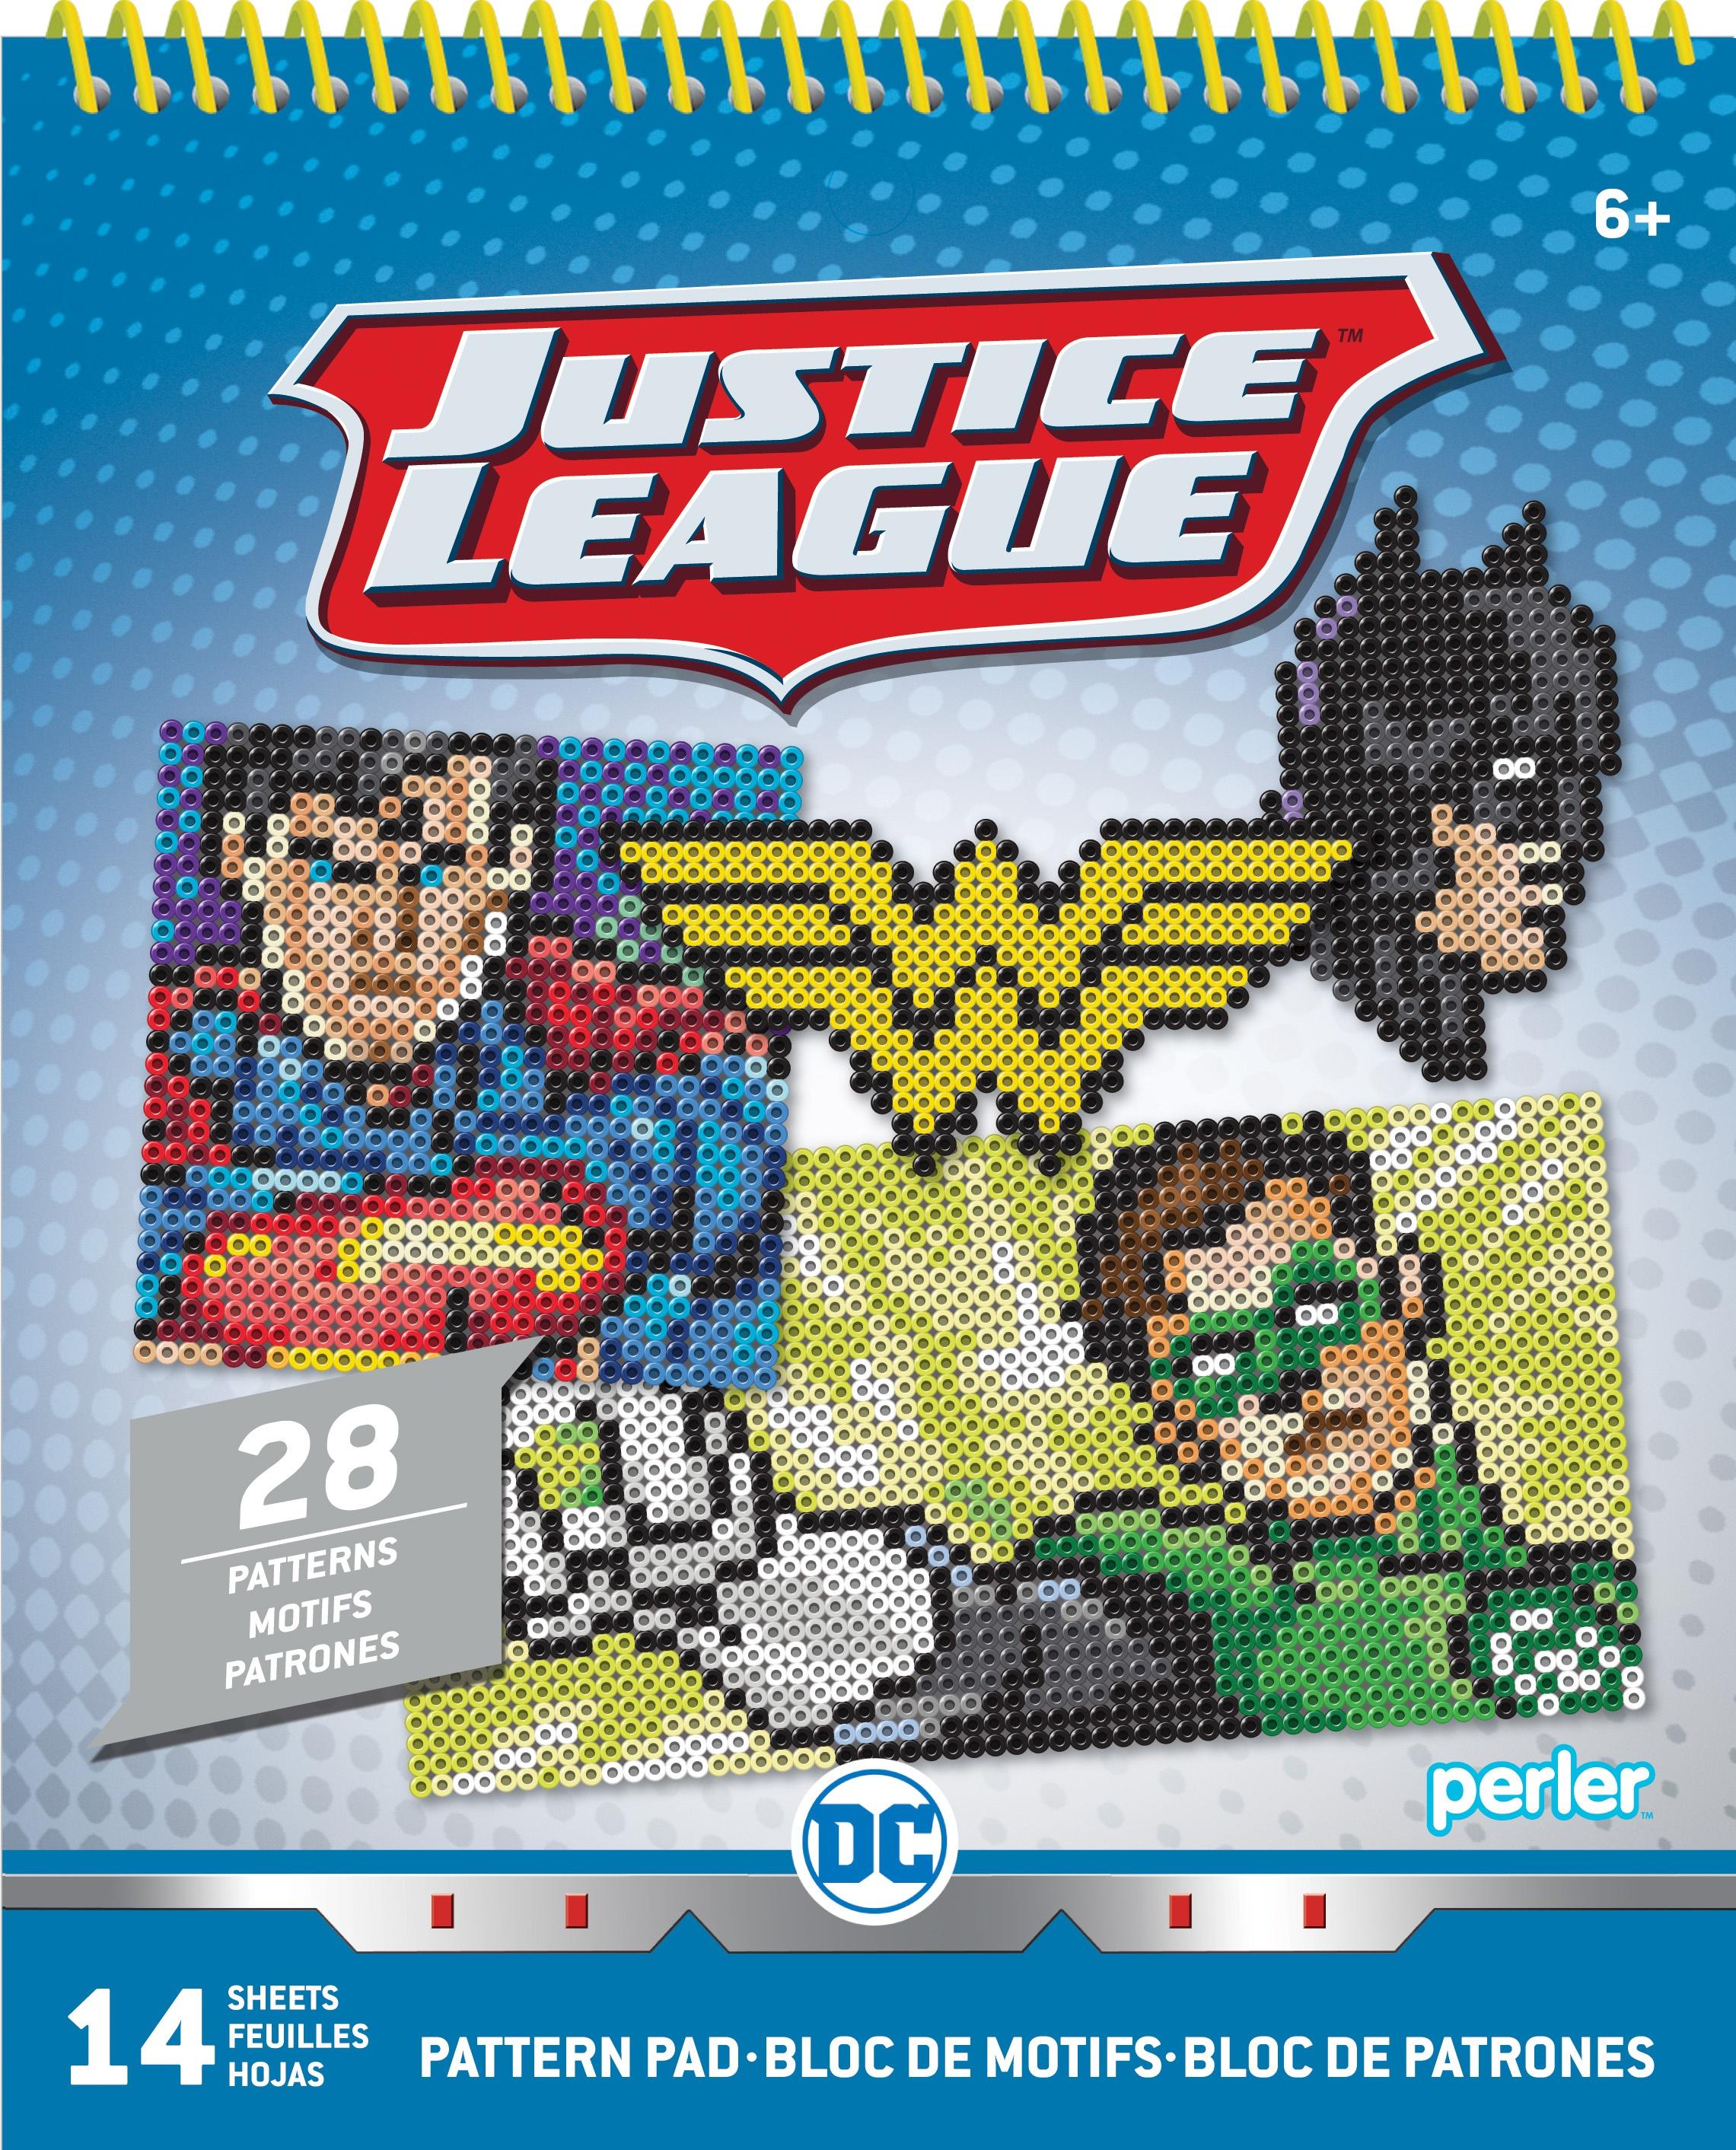 Perler Pattern Pad-Justice League 1